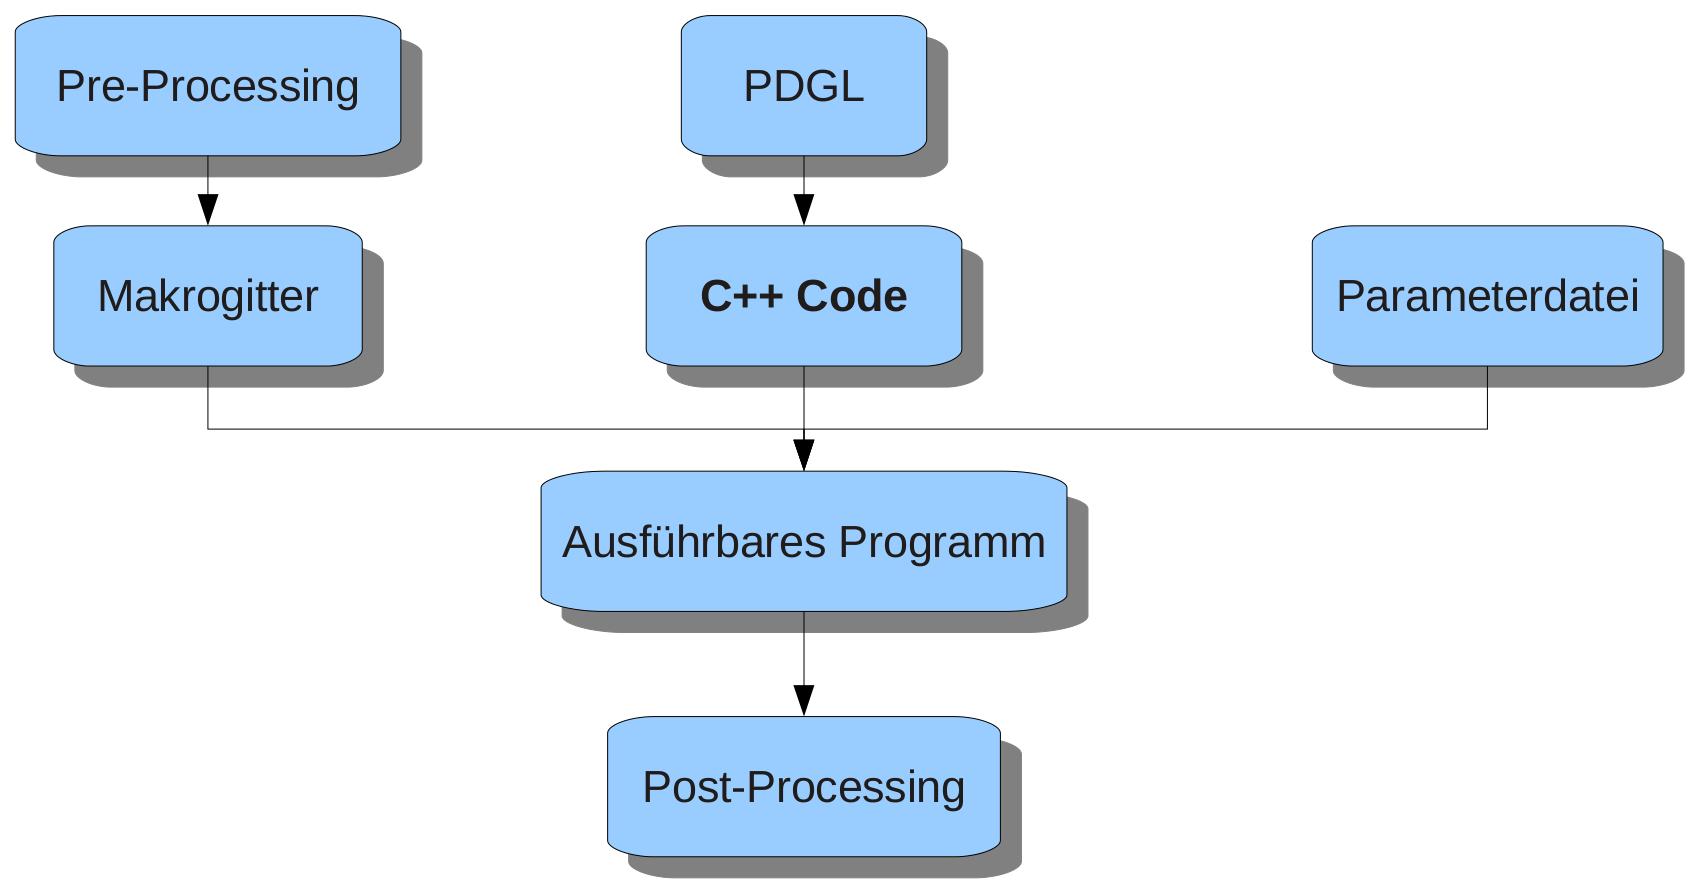 images/procedure.png